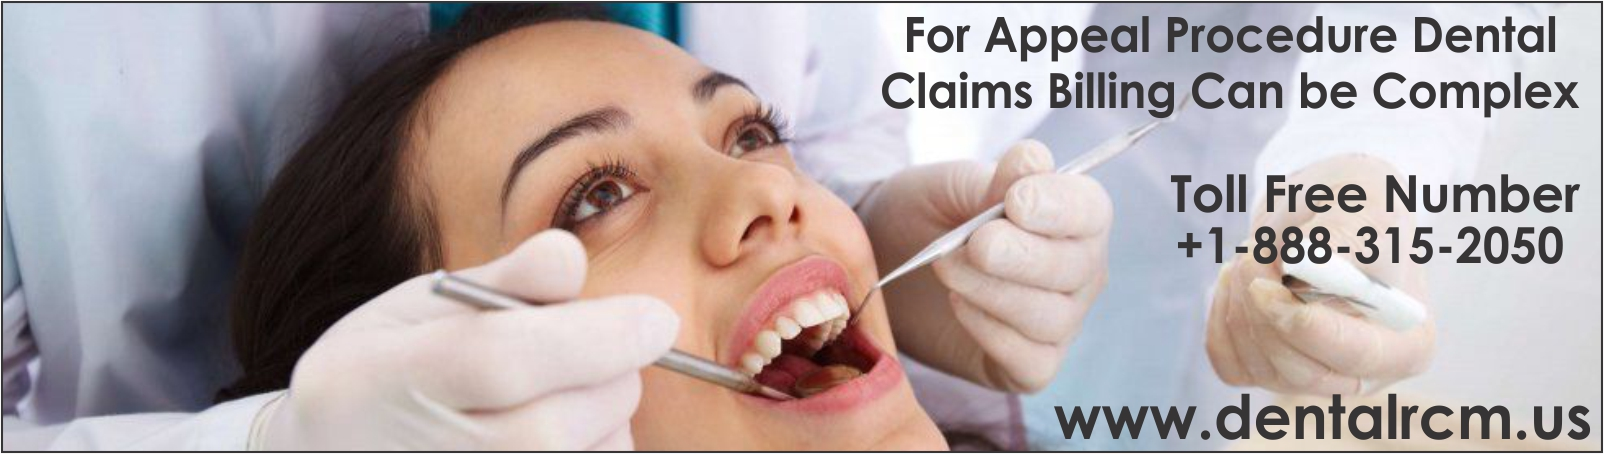 Benefits of Dental Insurance Verification Service by DentalRCM